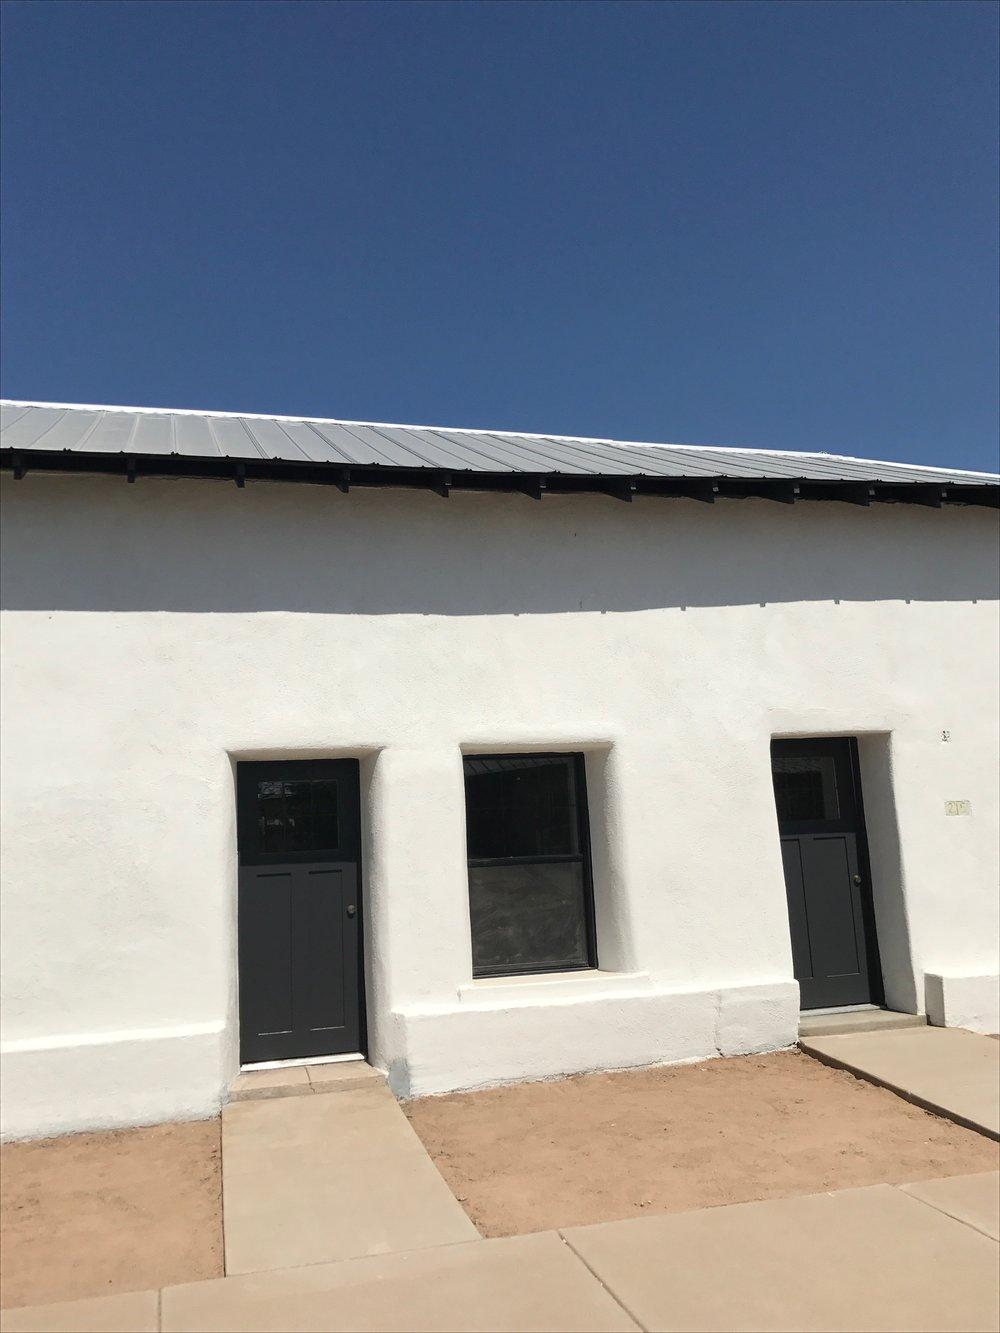 Rowhouse25 - Tremaine Ranch - Air BNB Rental - Phoenix, Arizona13.JPG